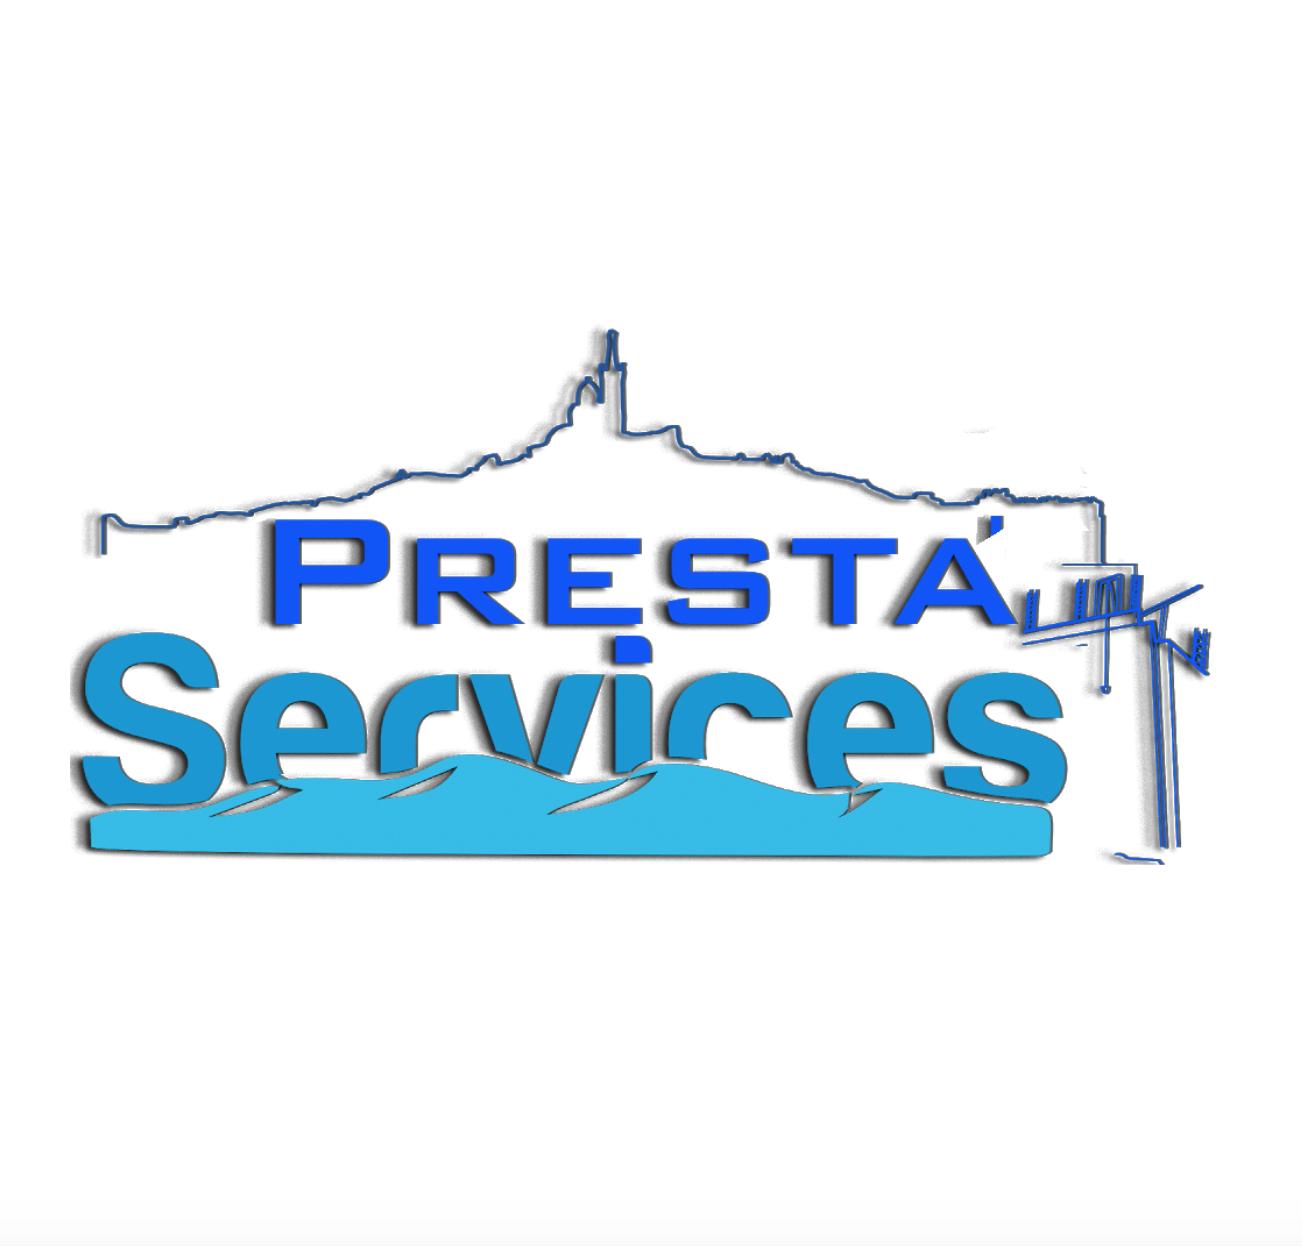 Presta services